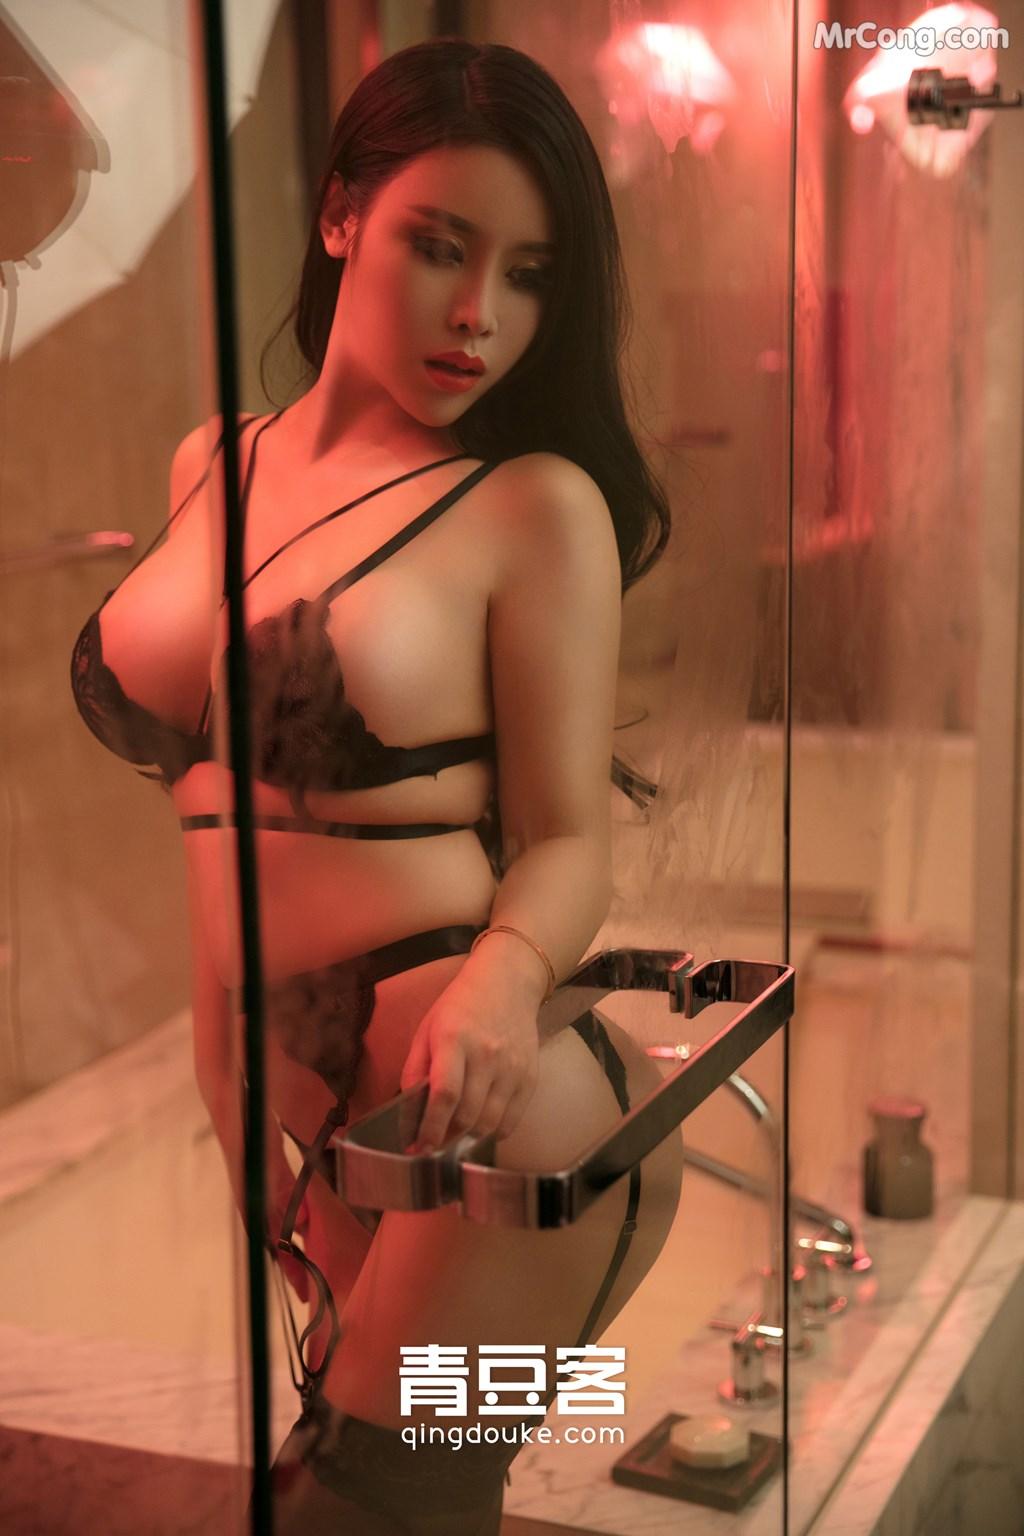 Image QingDouKe-2017-11-05-Ke-Rui-Na-MrCong.com-044 in post QingDouKe 2017-11-05: Người mẫu Ke Rui Na (可蕊娜) (48 ảnh)